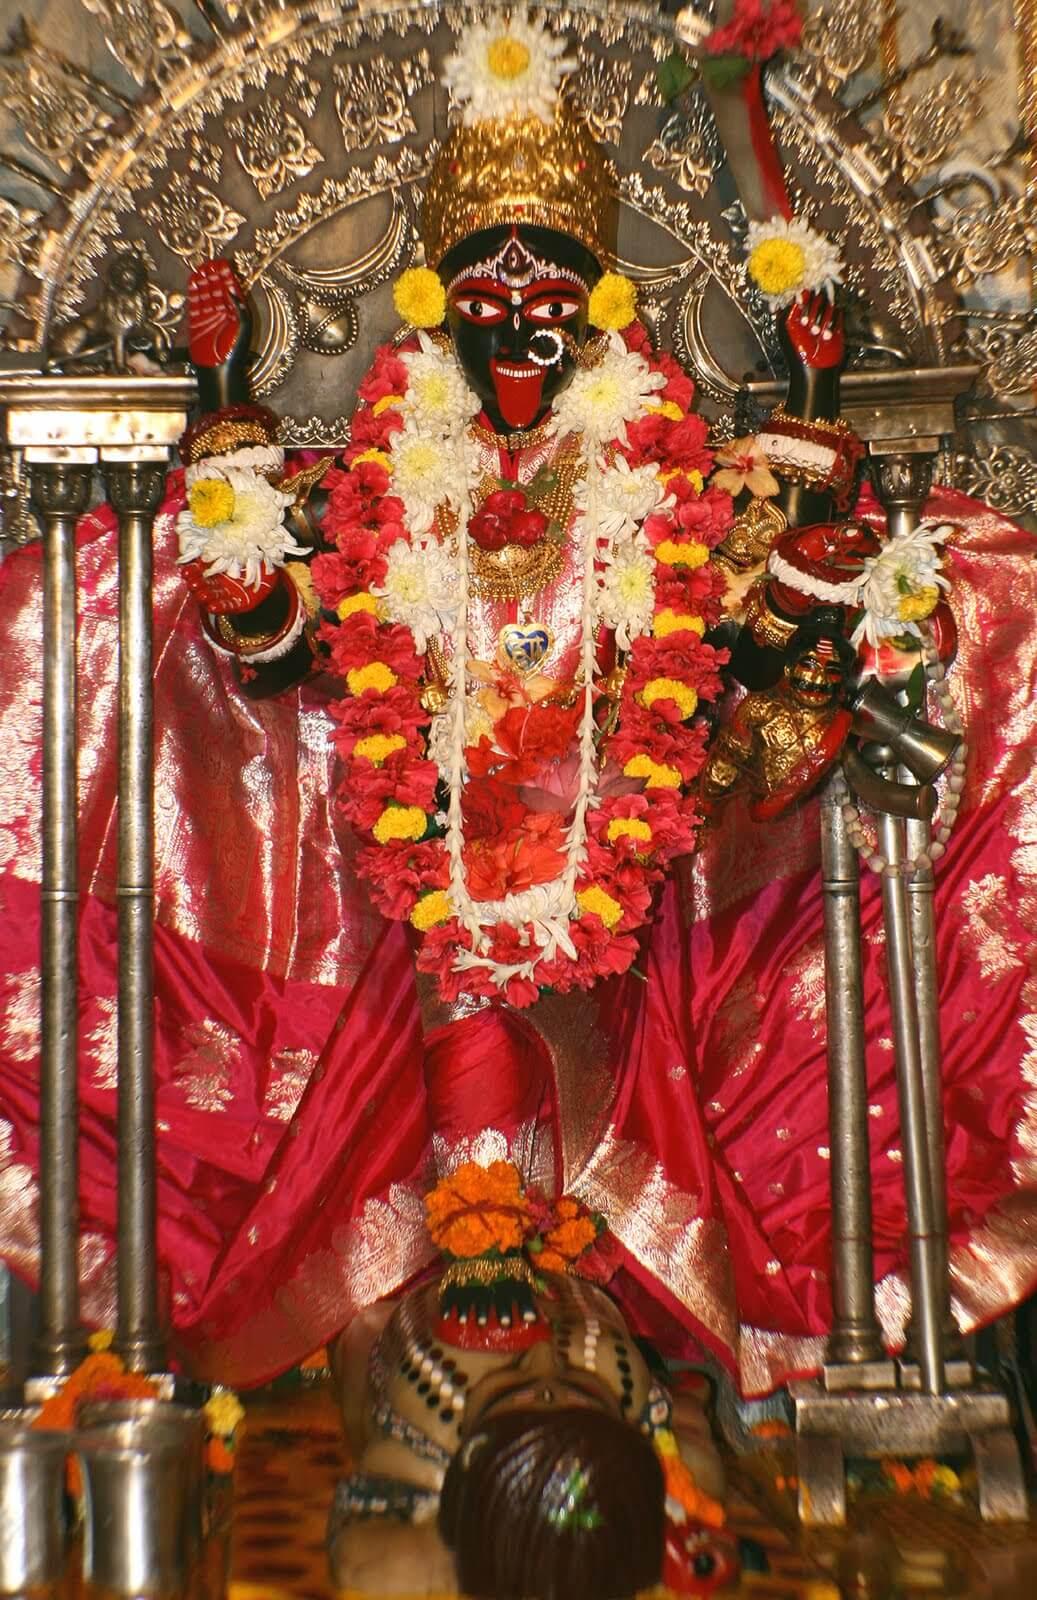 भद्र्काली – श्रीमाँ की अलौकिक कहानी